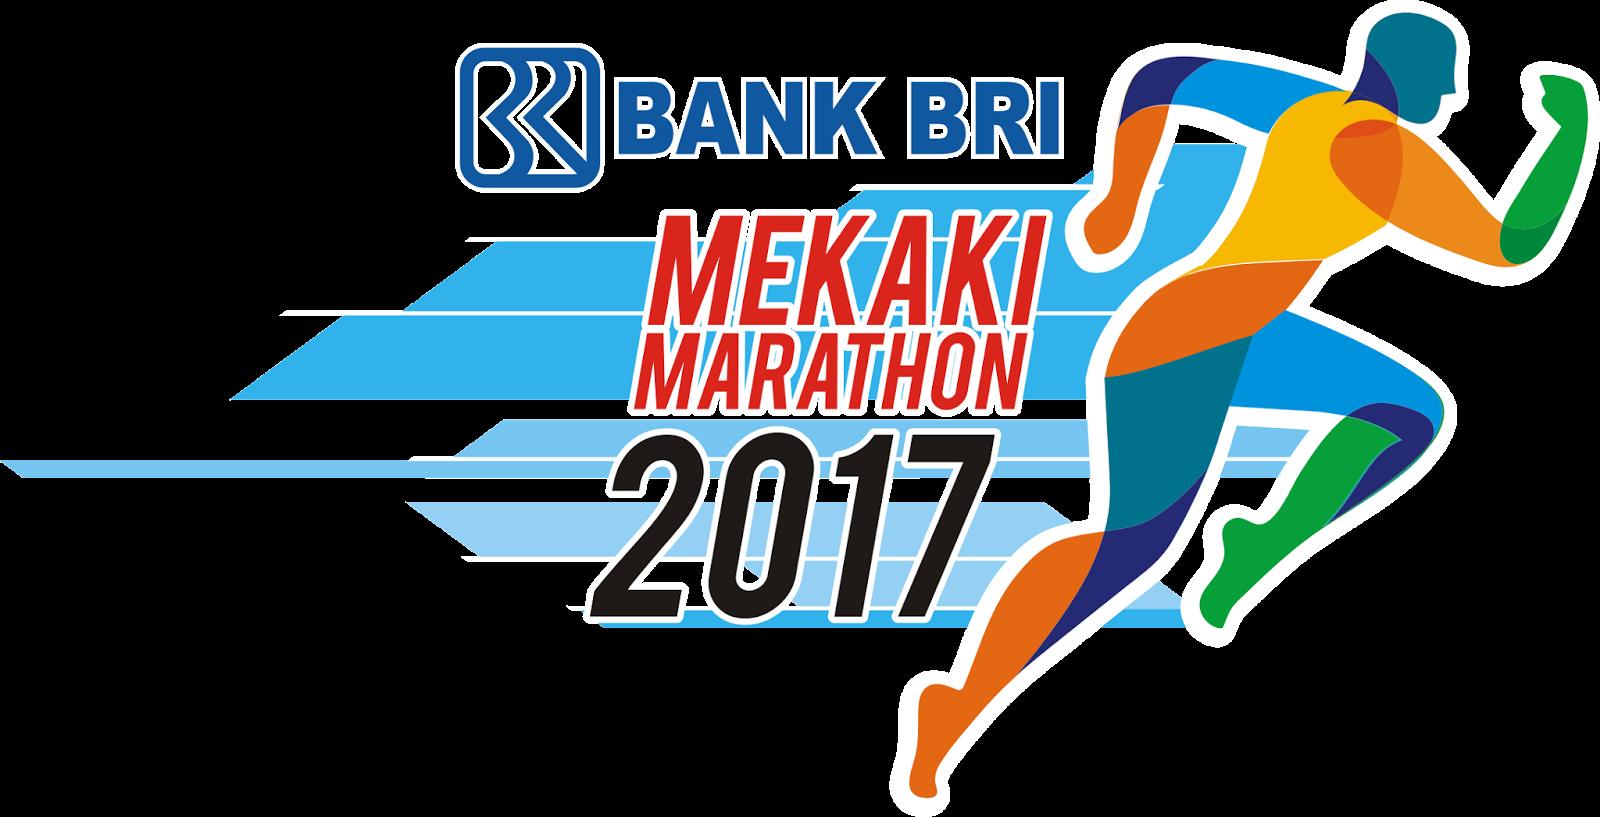 Blog Ilmu Matematika Mekaki Marathon 2017 In Lombok Oleh Yoyo Apriyanto Phone 085337633121